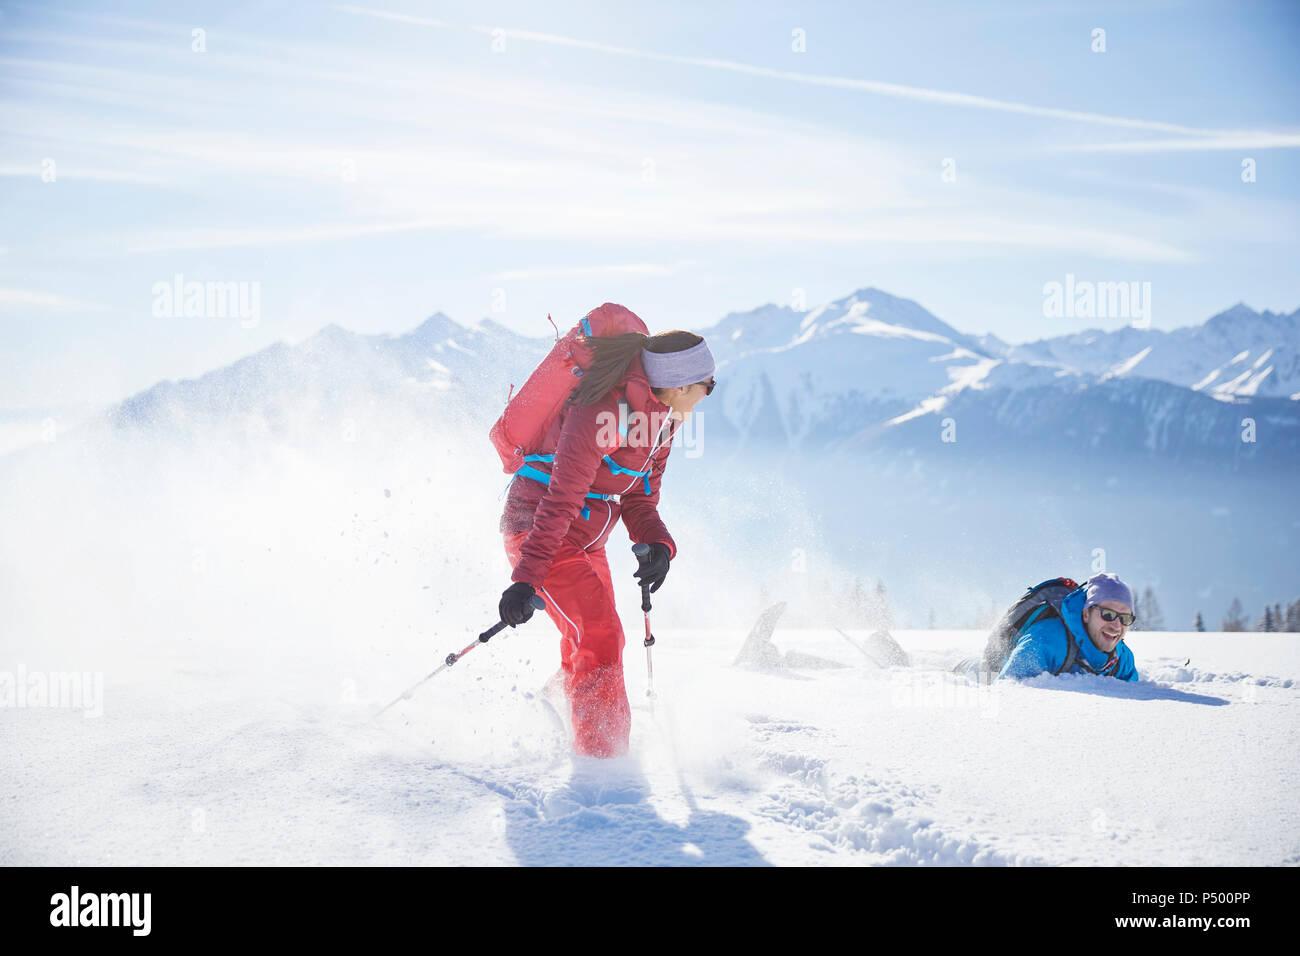 Österreich, Tirol, Schneeschuhwanderer durch den Schnee läuft, Mann fallen Stockbild